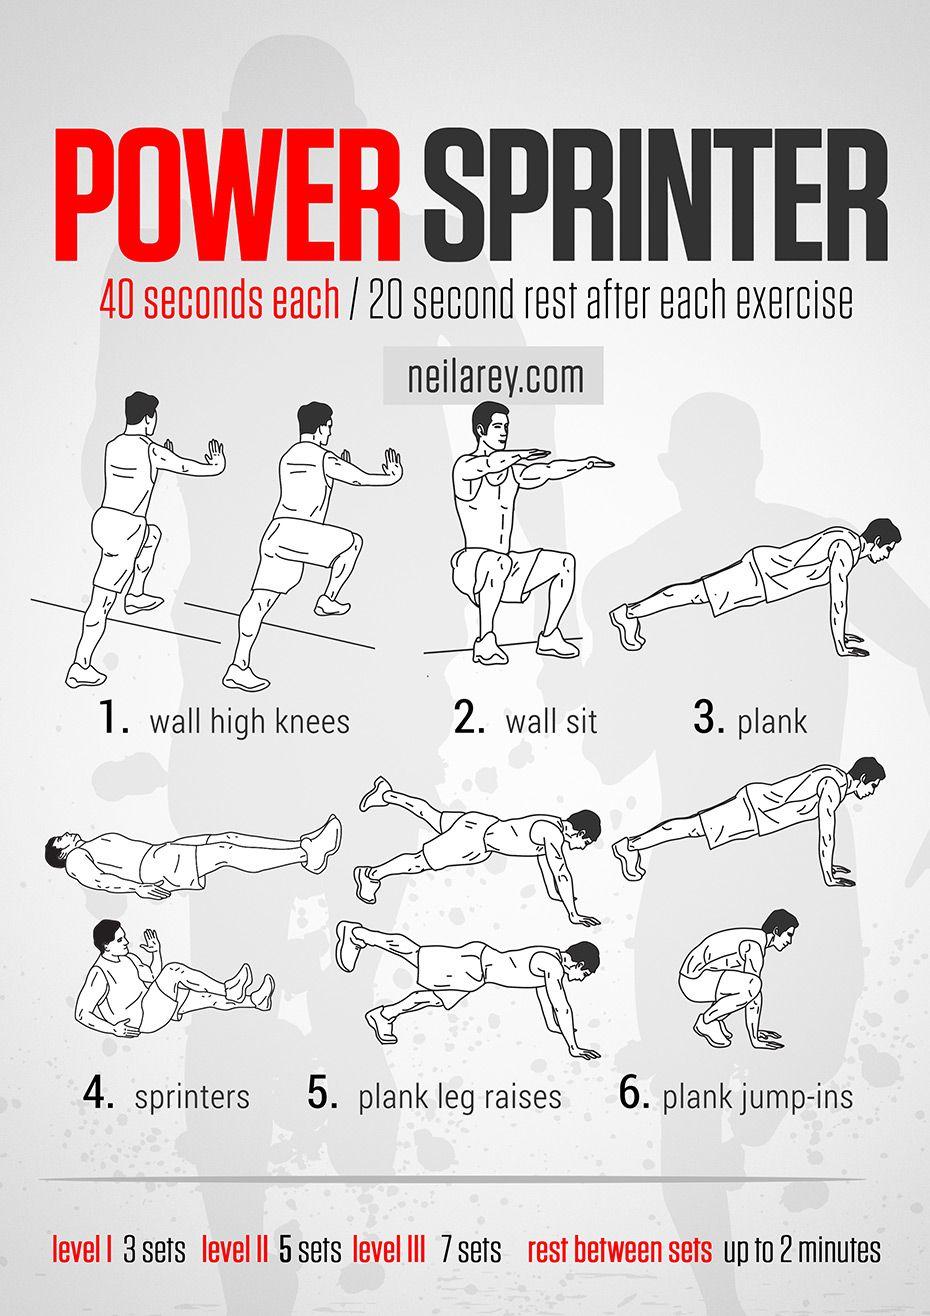 pin od arkadiusz piotrowski na trening | pinterest | sprinter